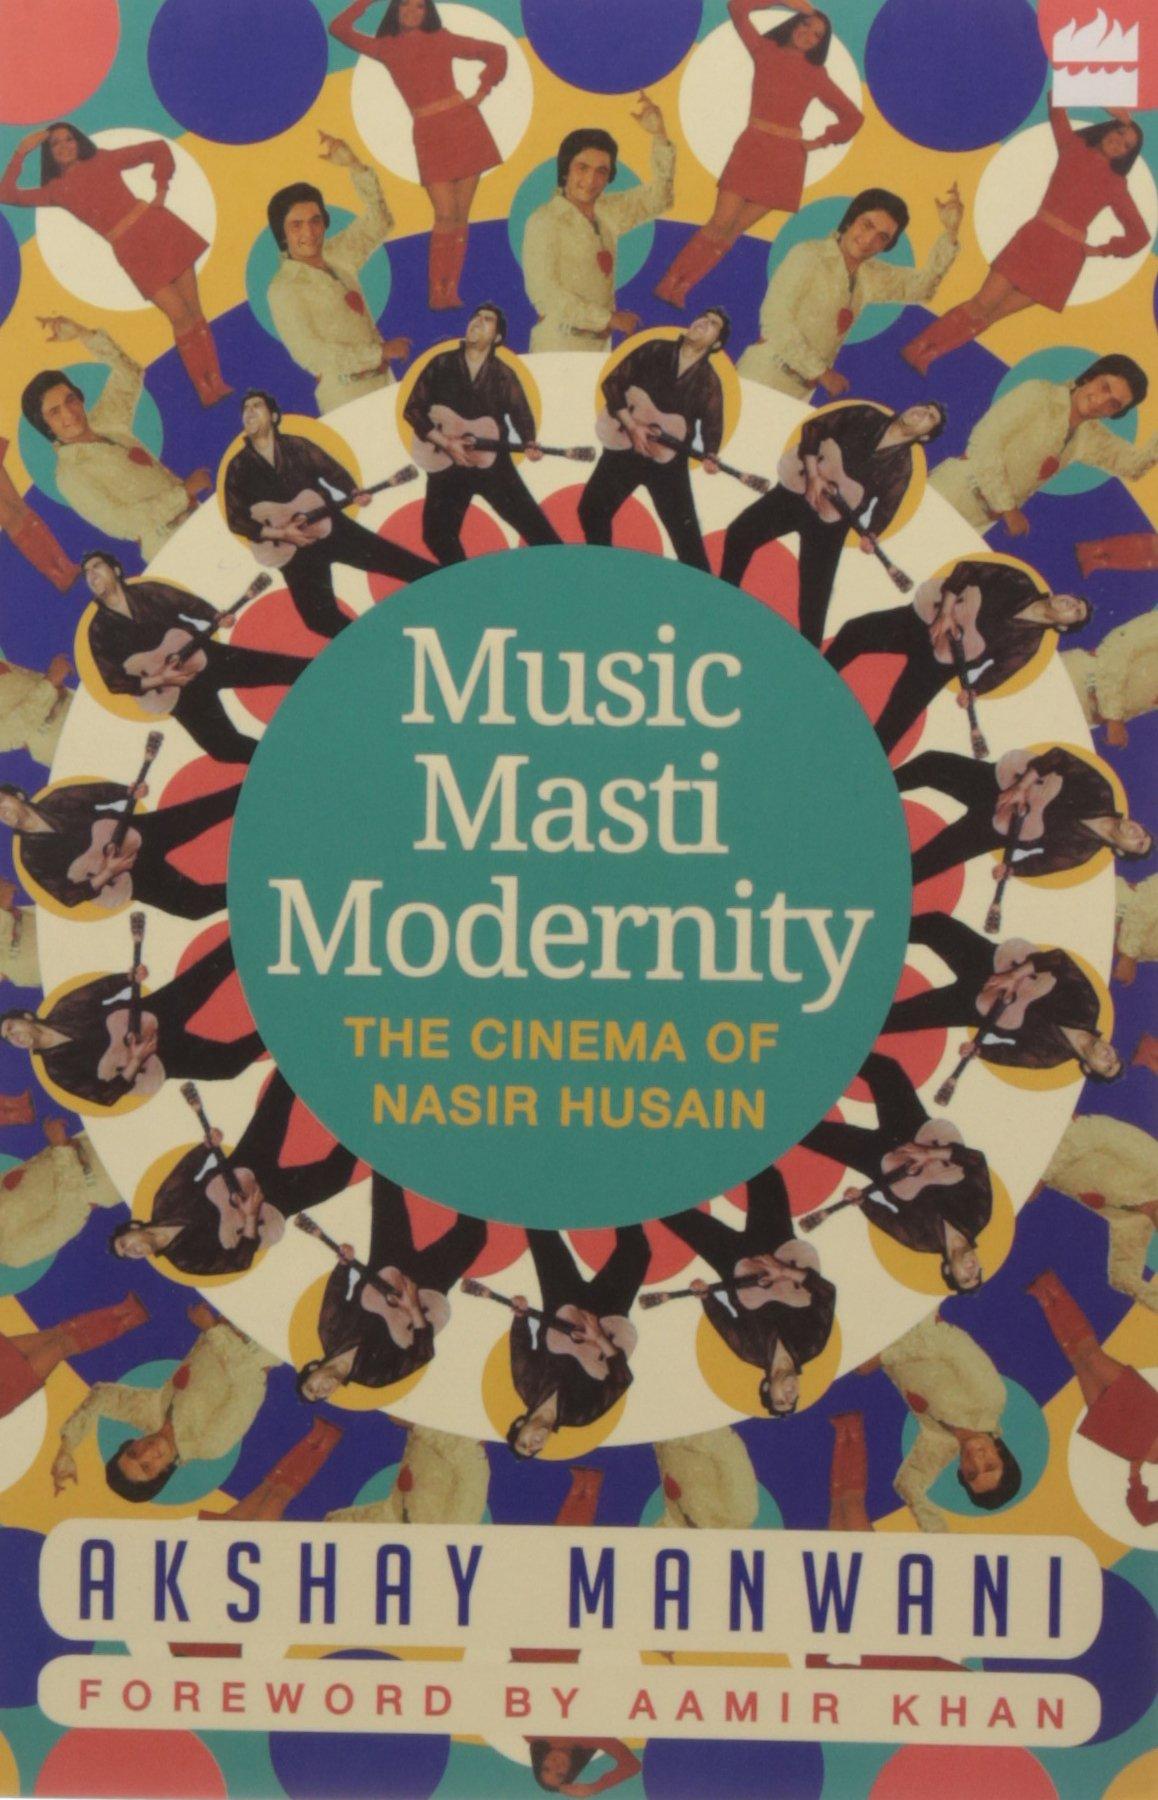 Buy Music, Masti, Modernity: The Cinema of Nasir Husain Book Online